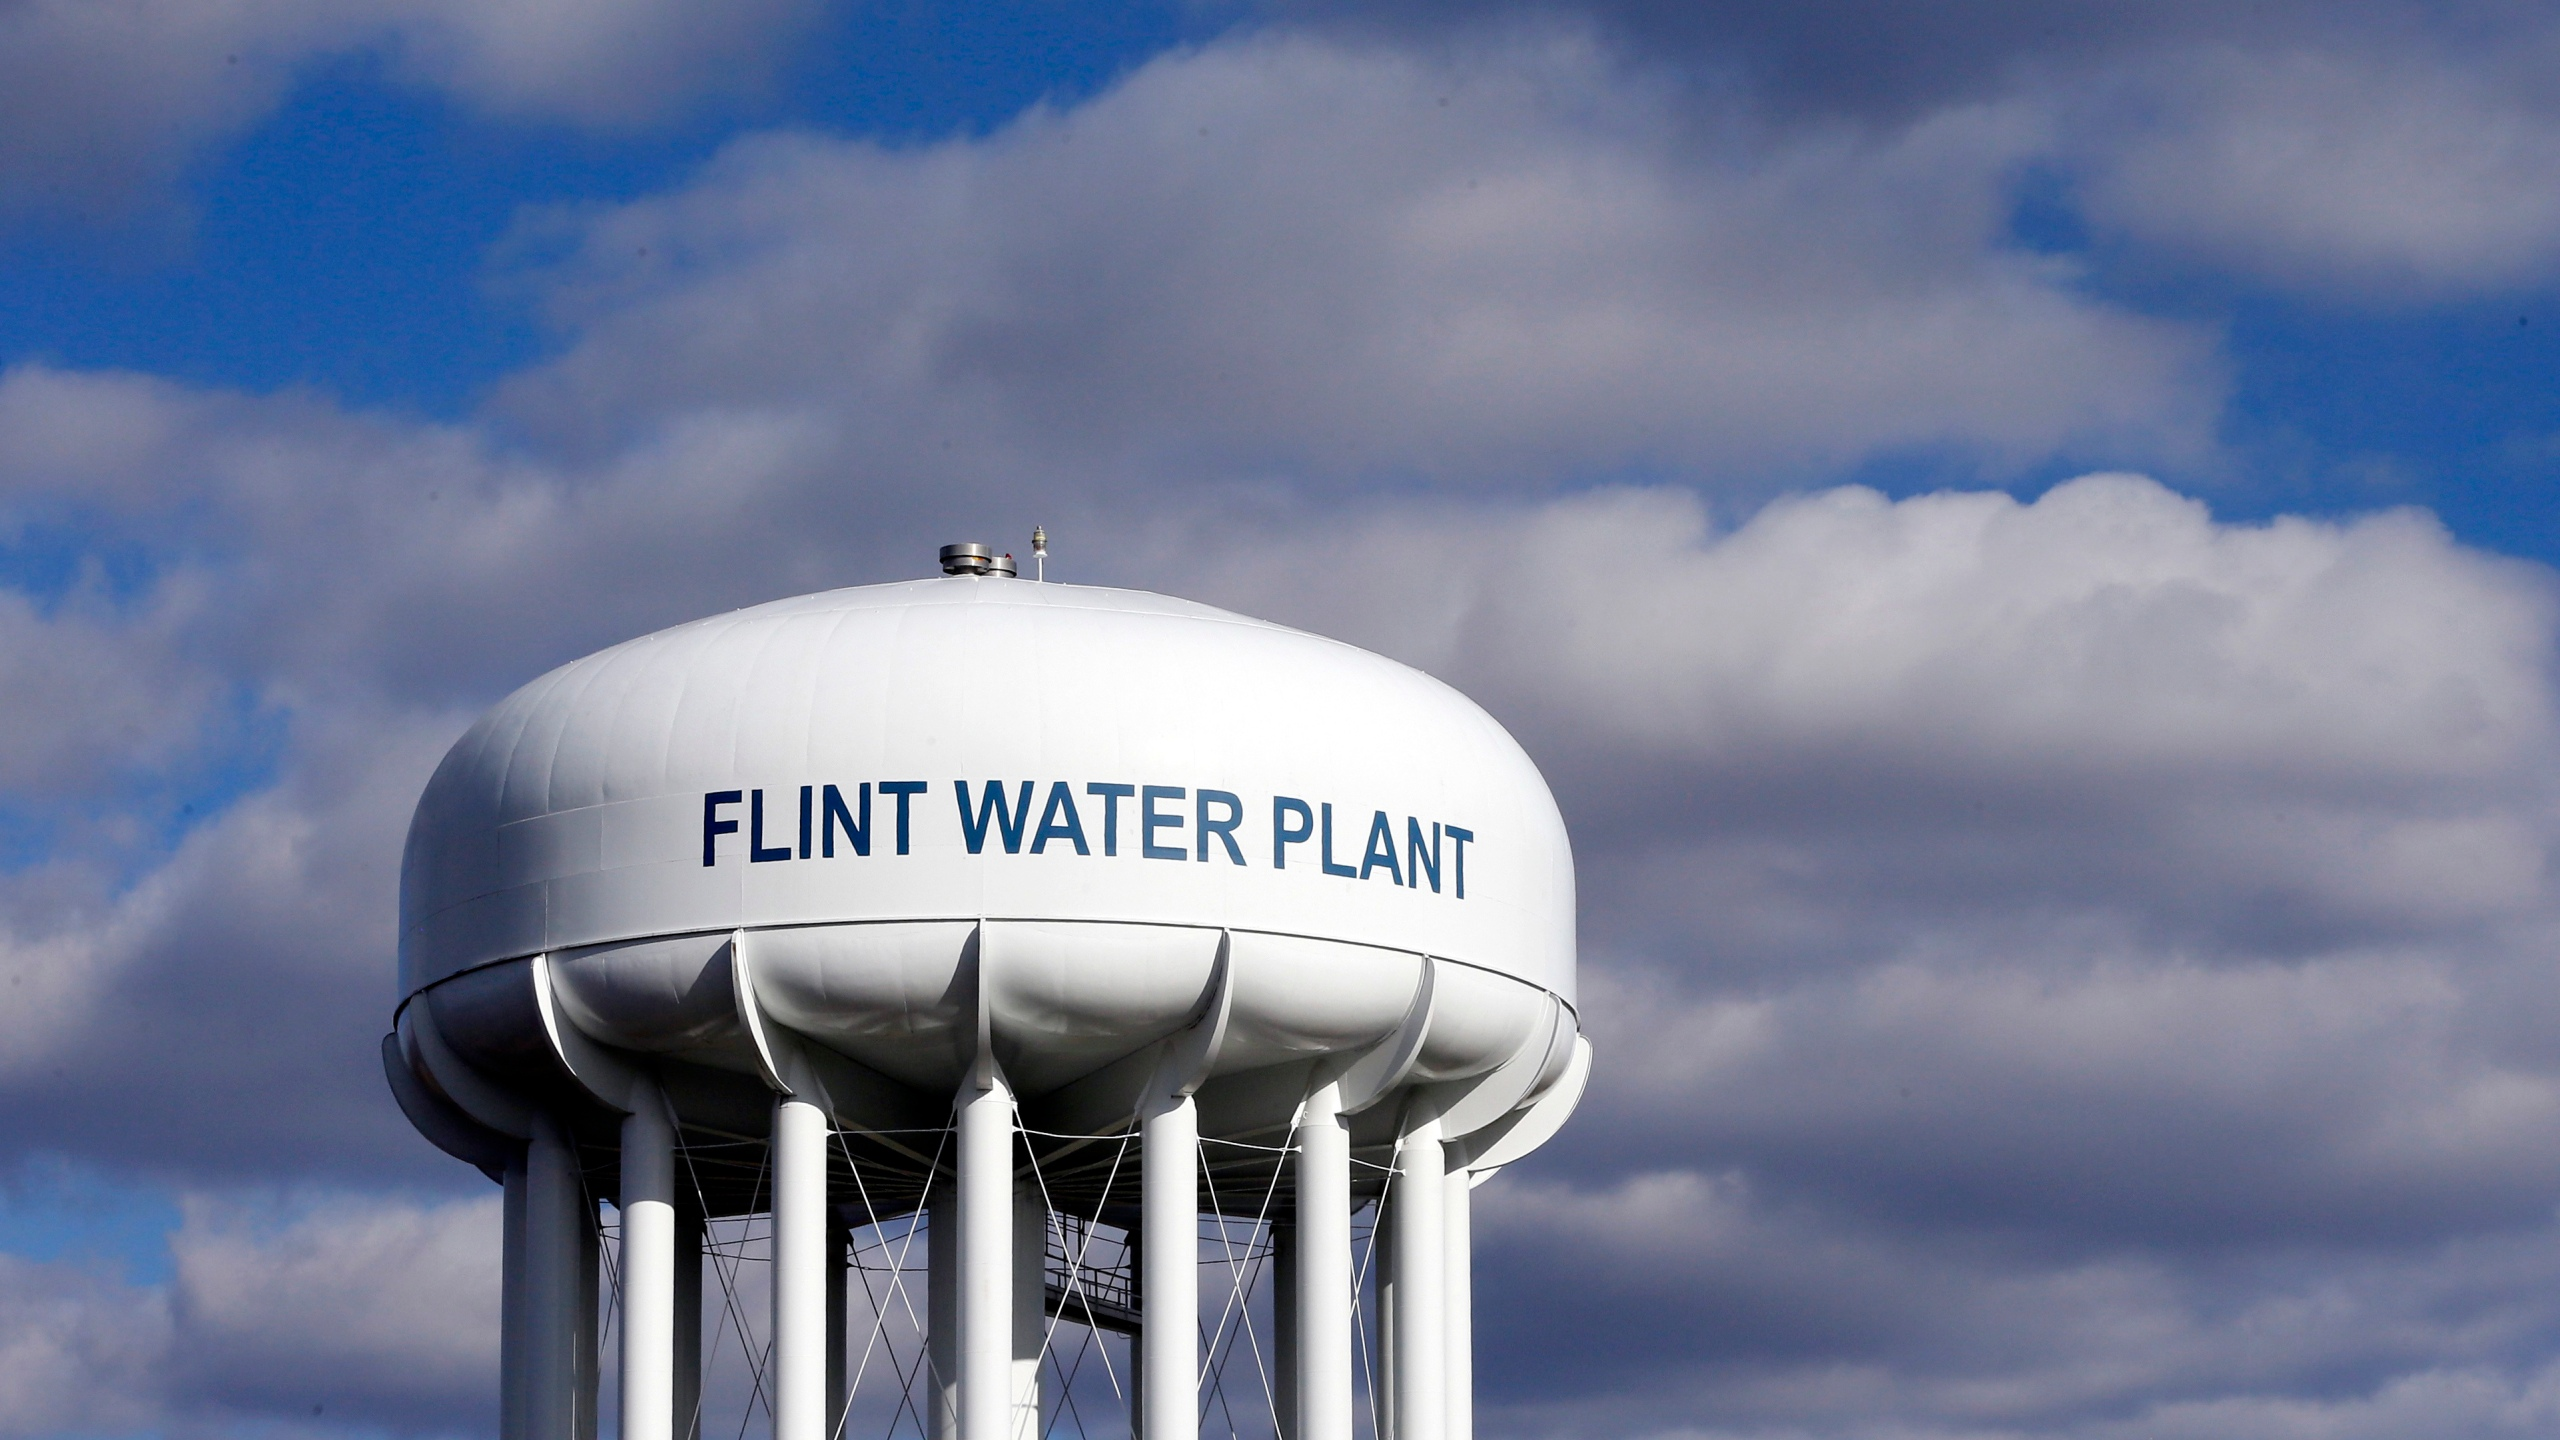 Michigan Reaches 600m Deal In Flint Water Crisis Wgn Tv